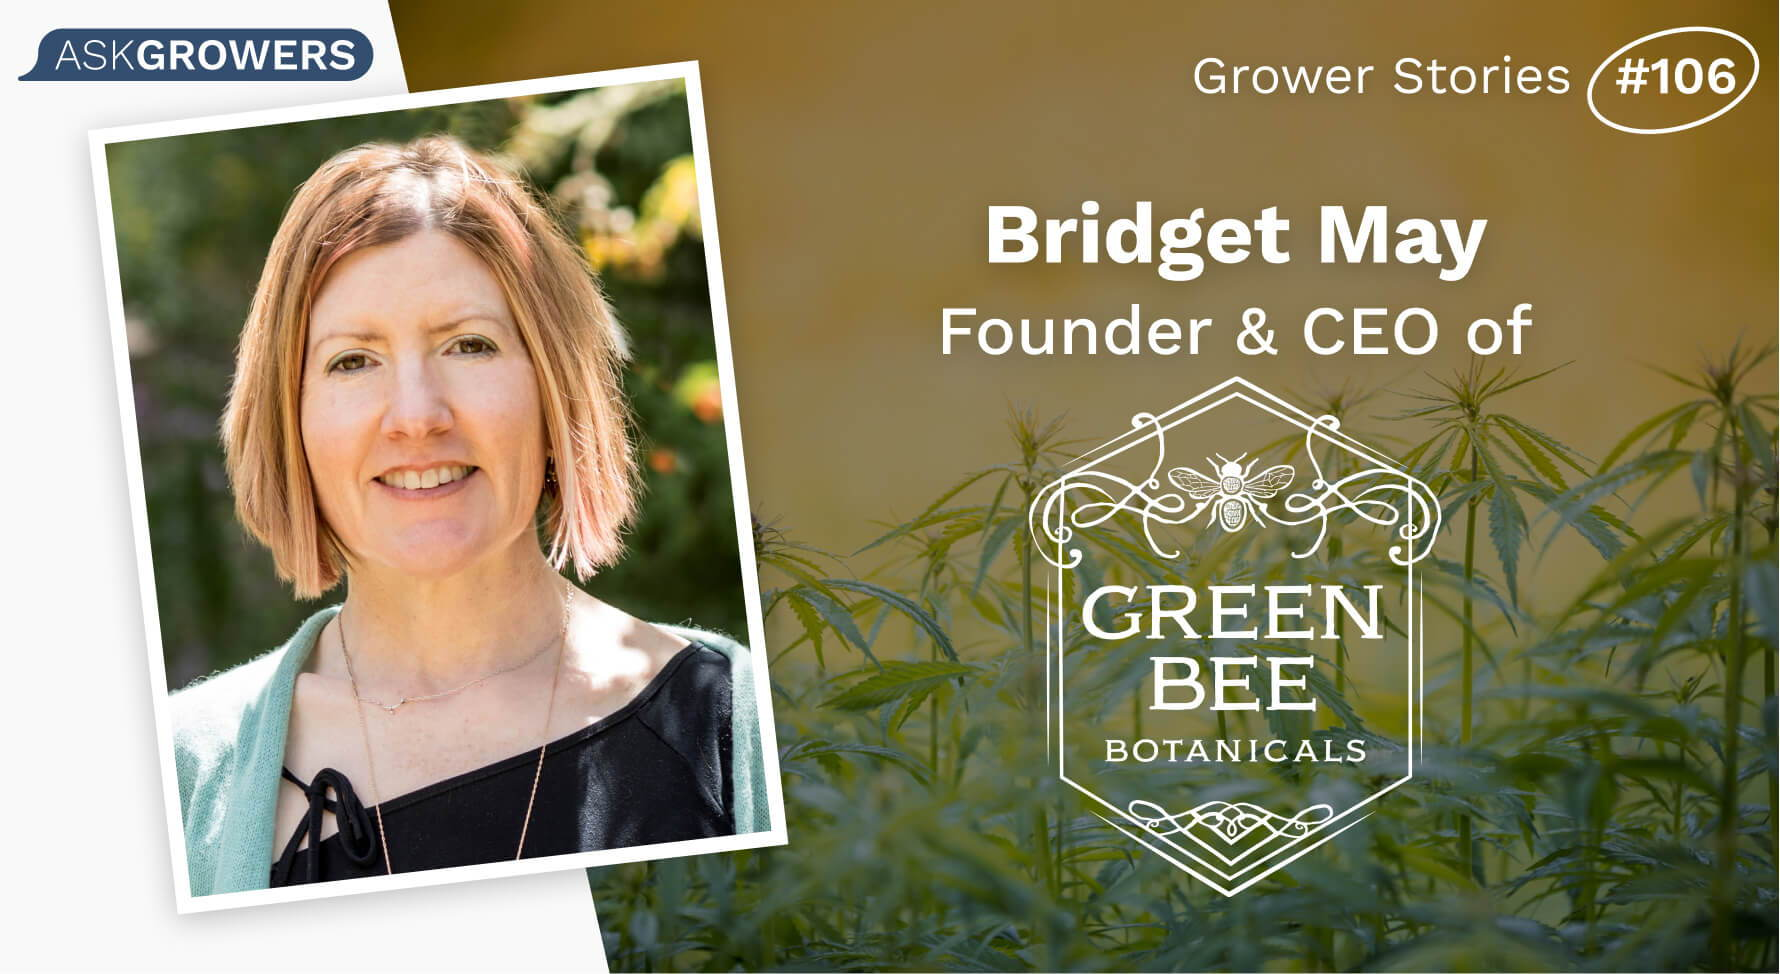 Bridget May